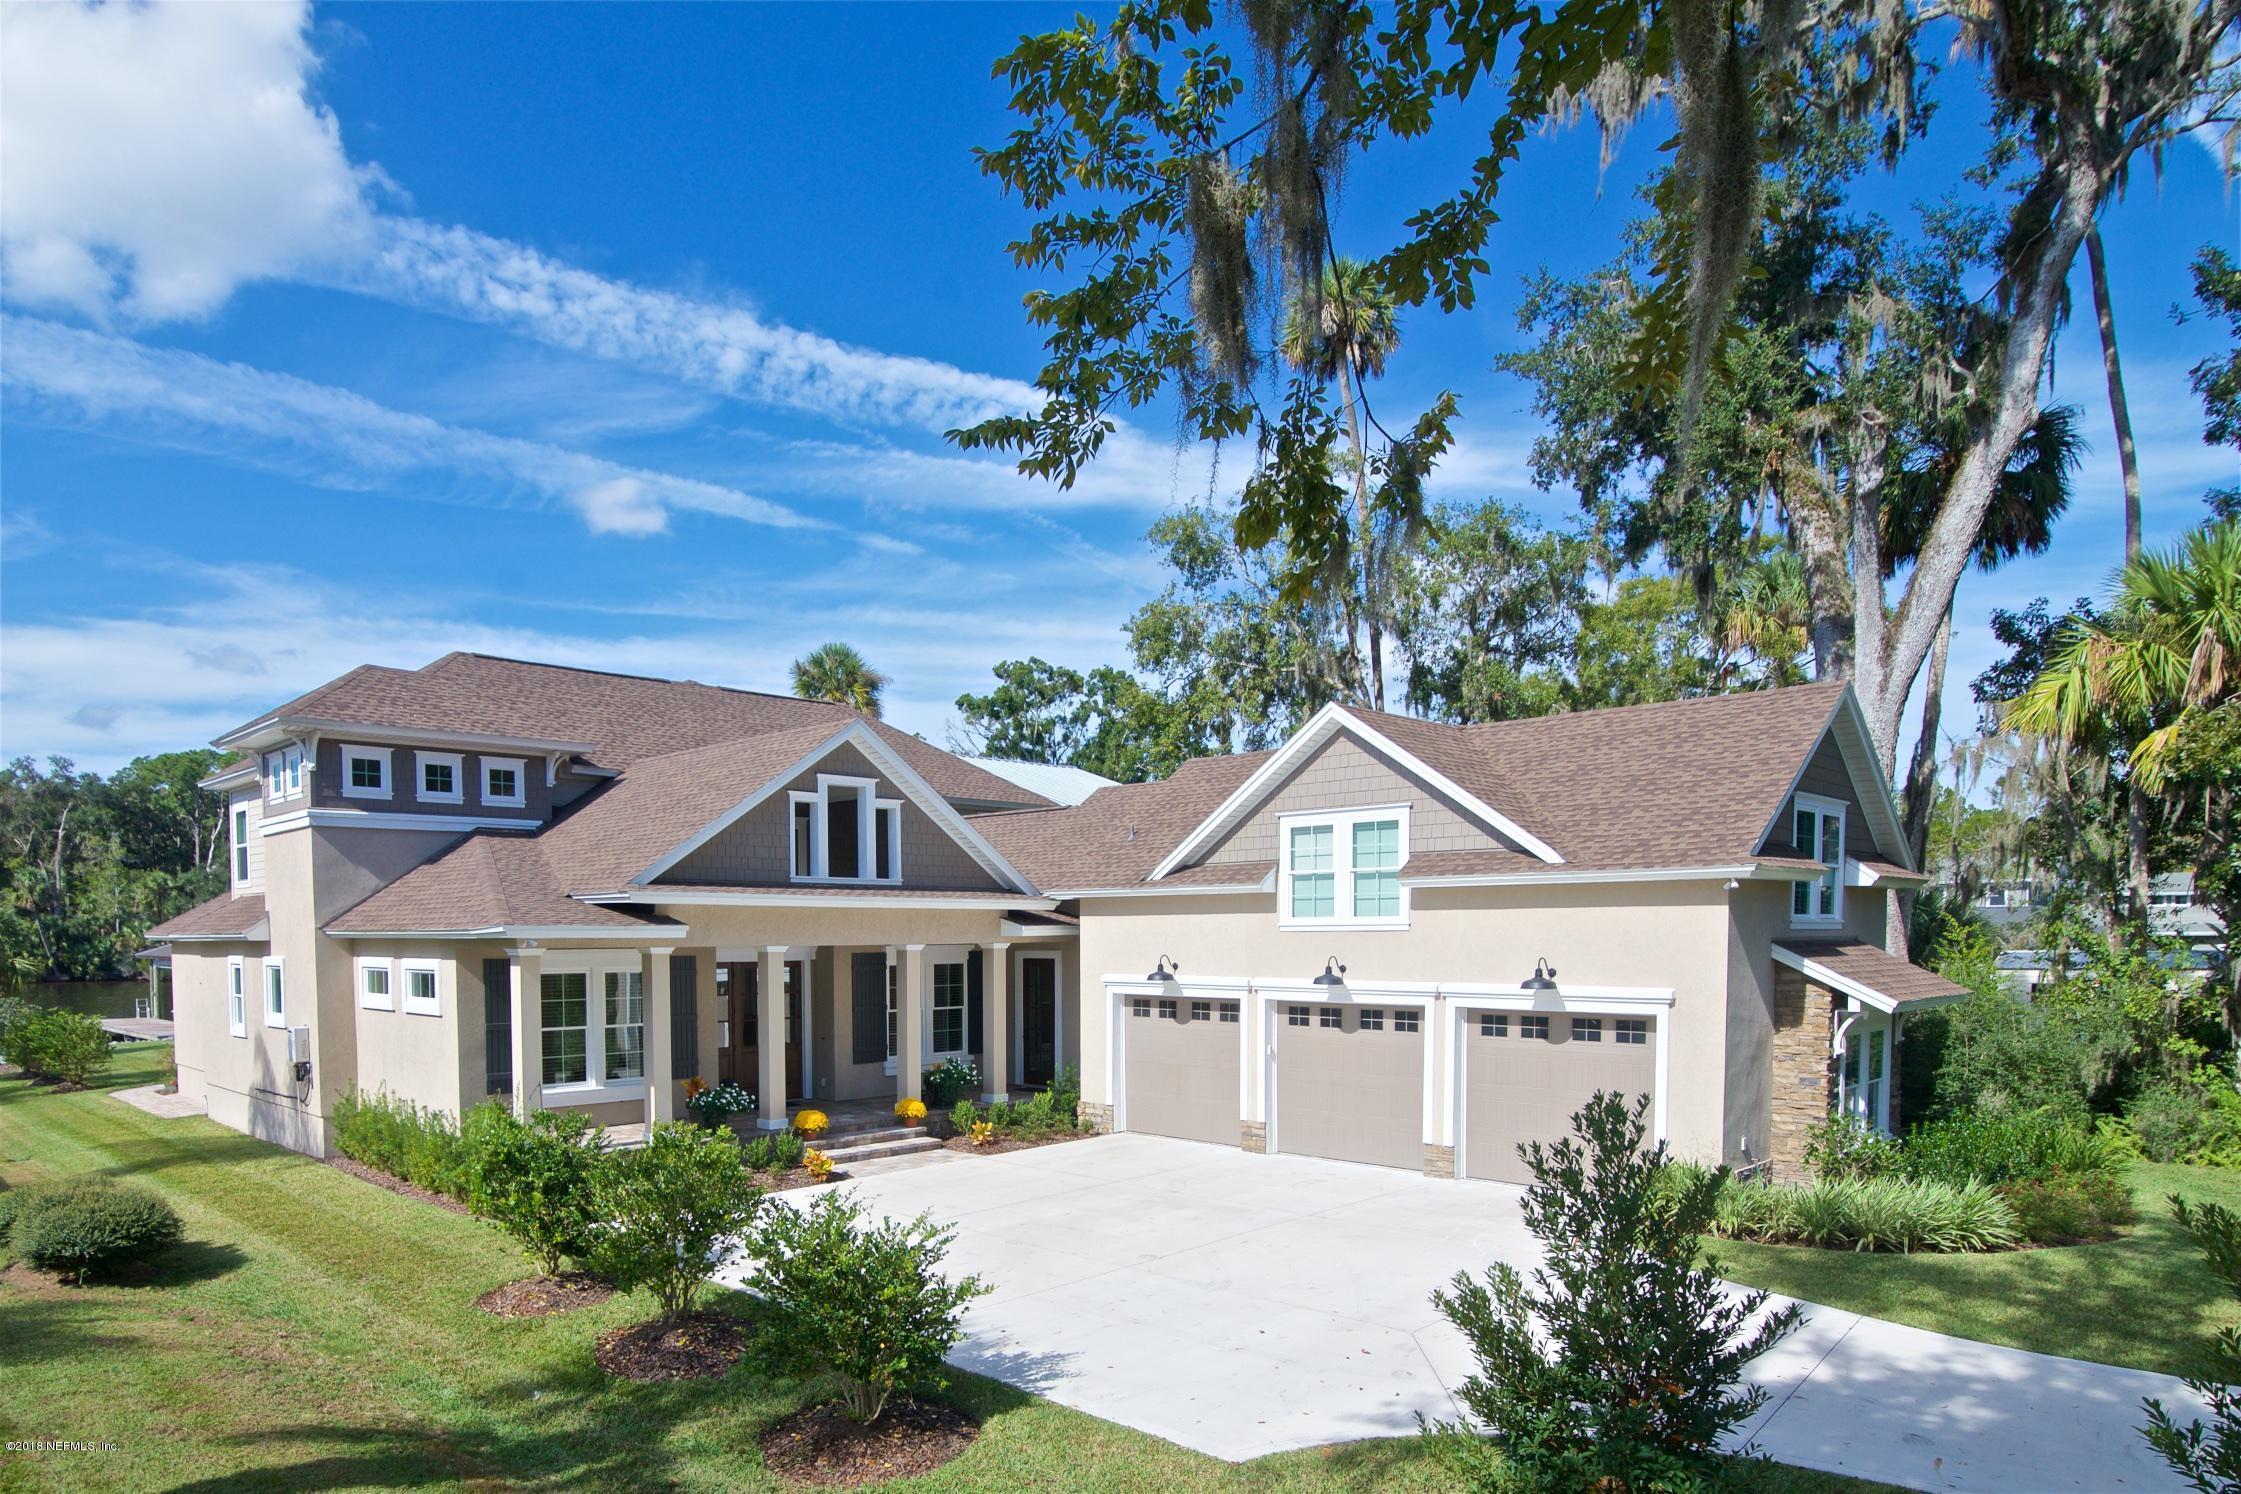 55 ROSCOE, PONTE VEDRA BEACH, FLORIDA 32082, 5 Bedrooms Bedrooms, ,4 BathroomsBathrooms,Residential - single family,For sale,ROSCOE,966495